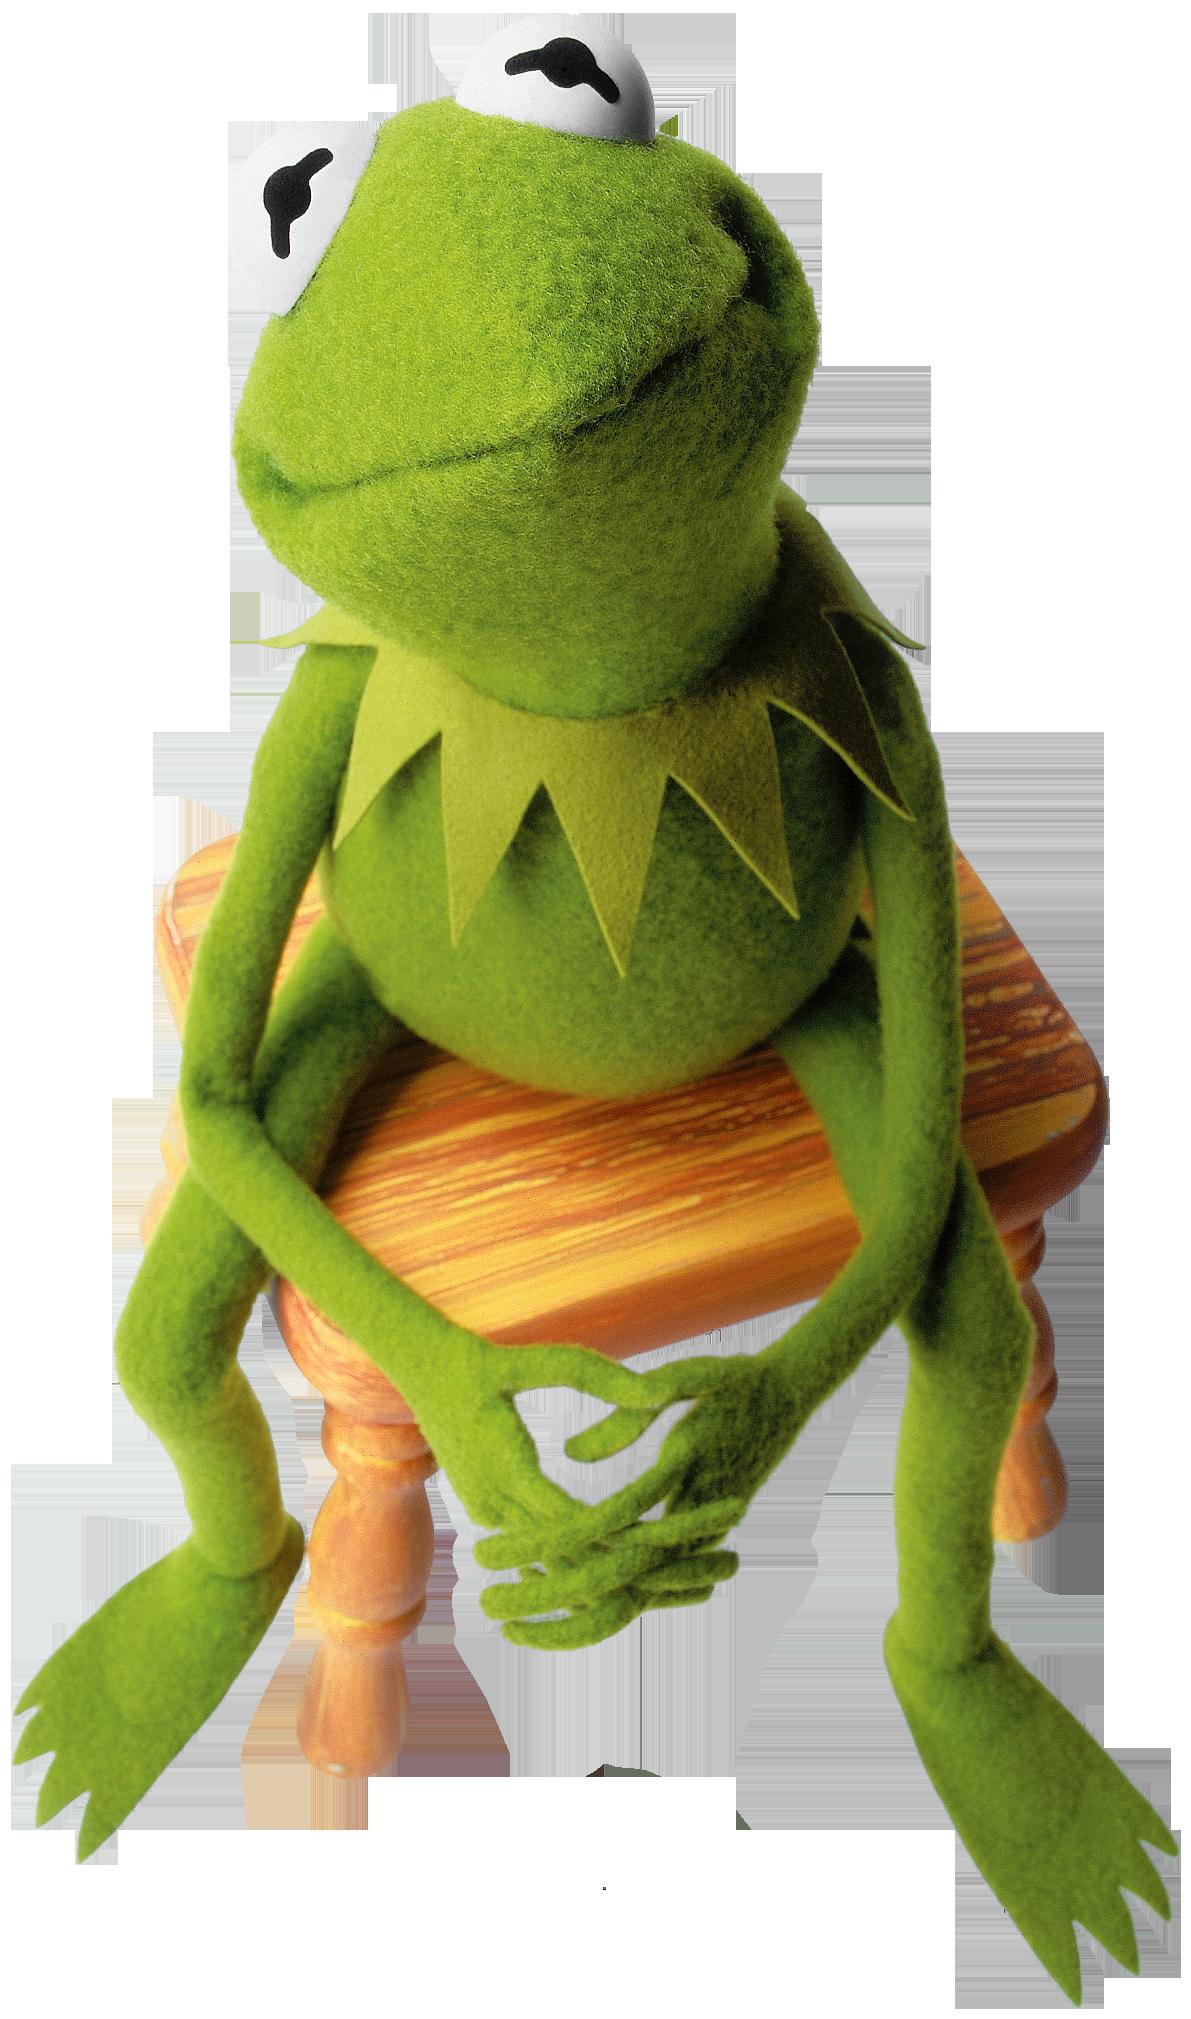 Kermit Tea Quotes Kermit Quotes | www.ga...